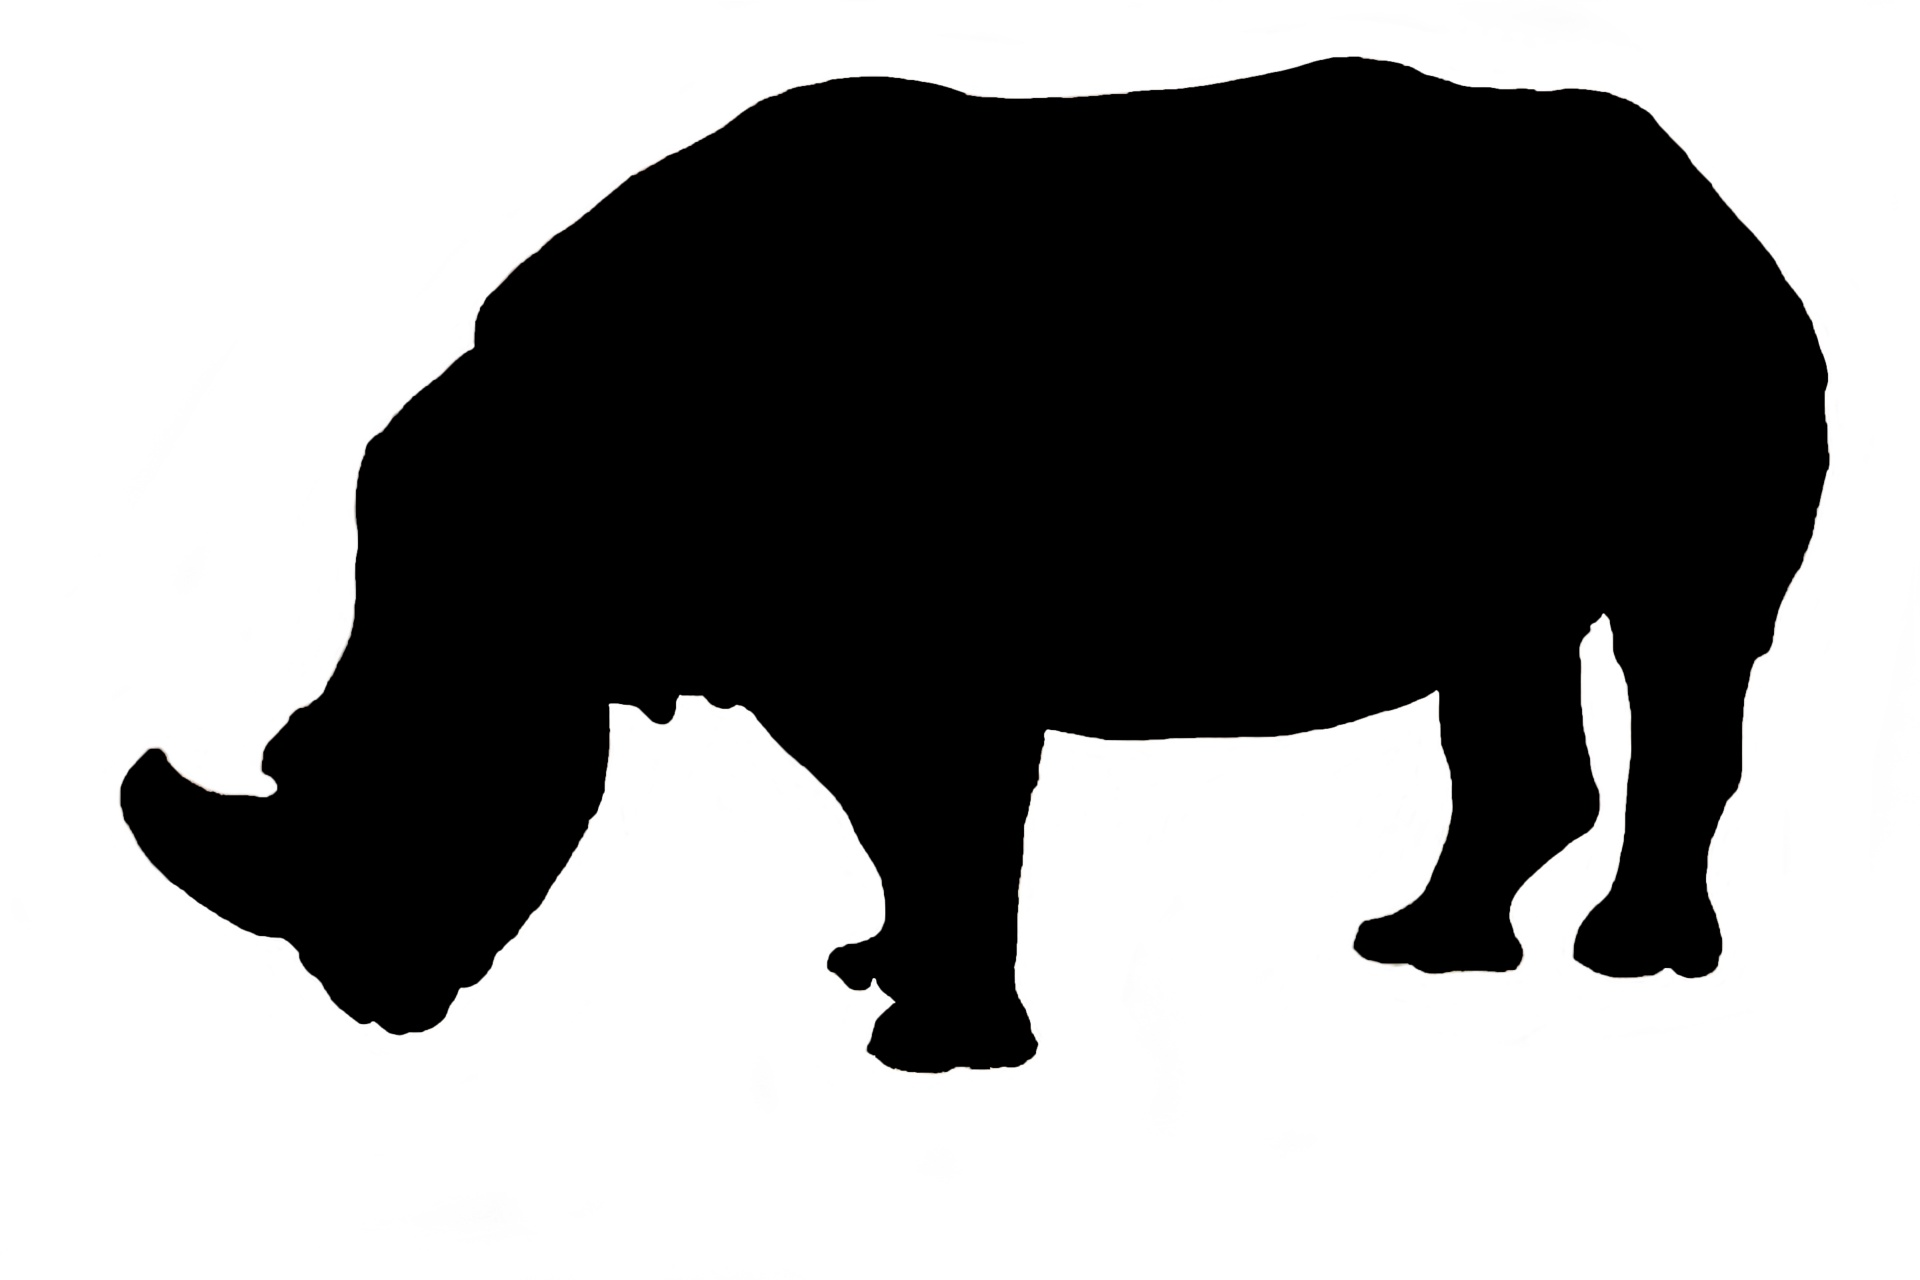 1920x1280 Rhino, Silhouette Free Stock Photo